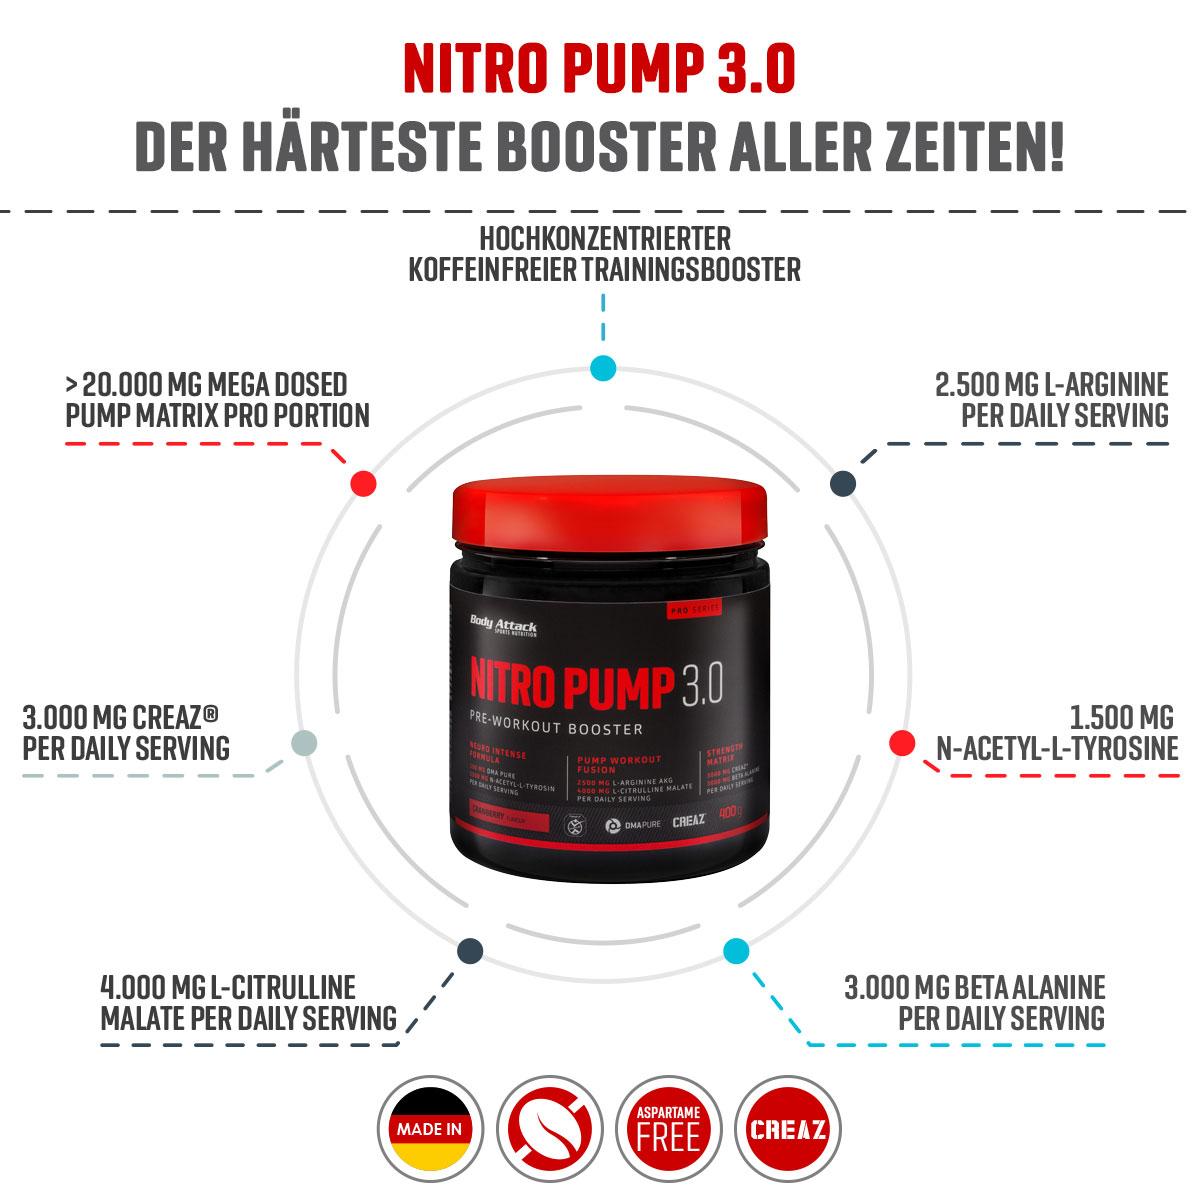 Nitro Pump 3.0 Info